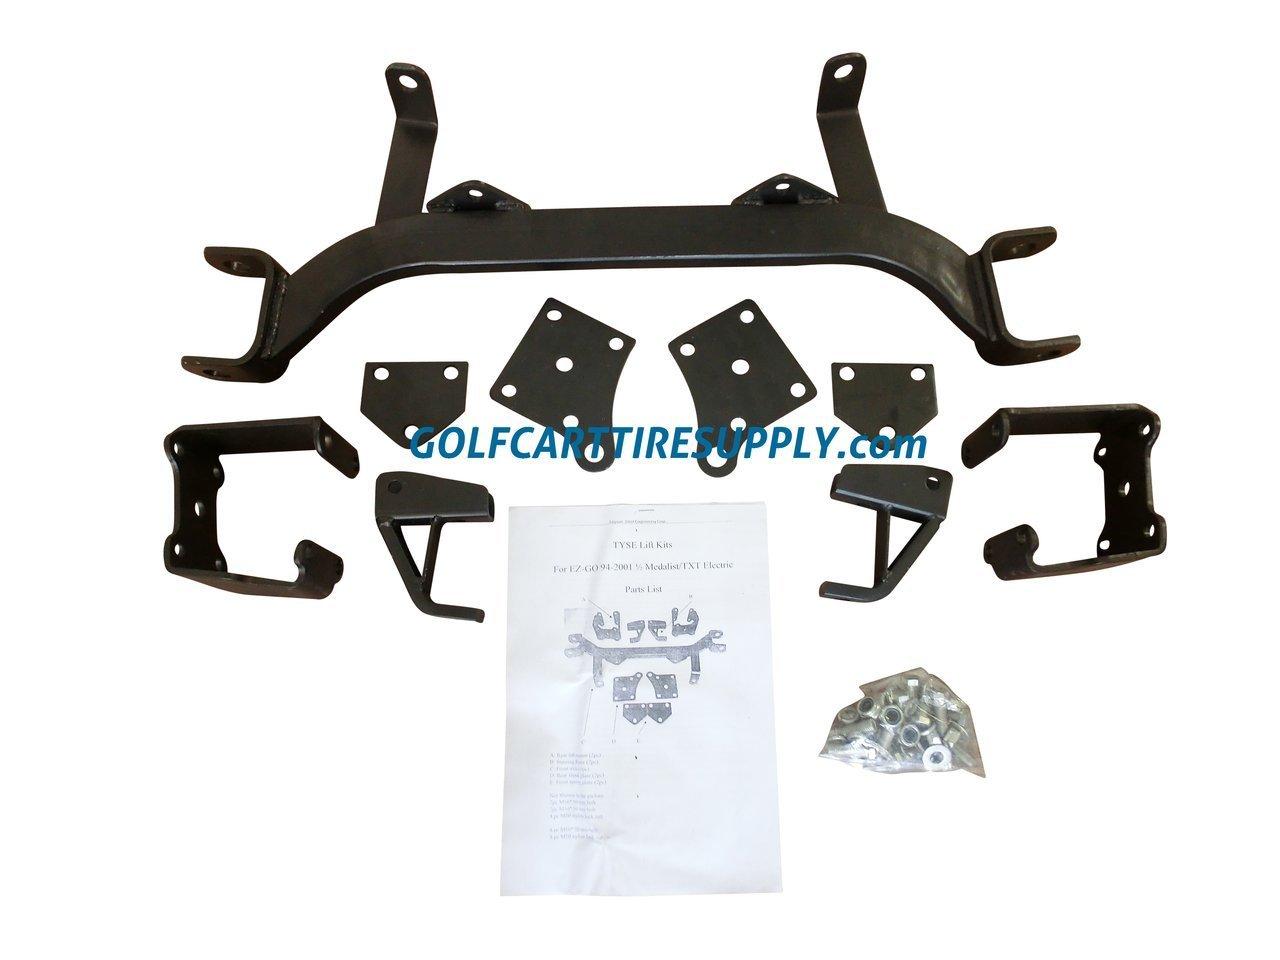 "6"" Drop Axle EZGO Golf Cart Lift Kit for 1994-2001.5 TXT / MEDALIST Electric Golf Carts"